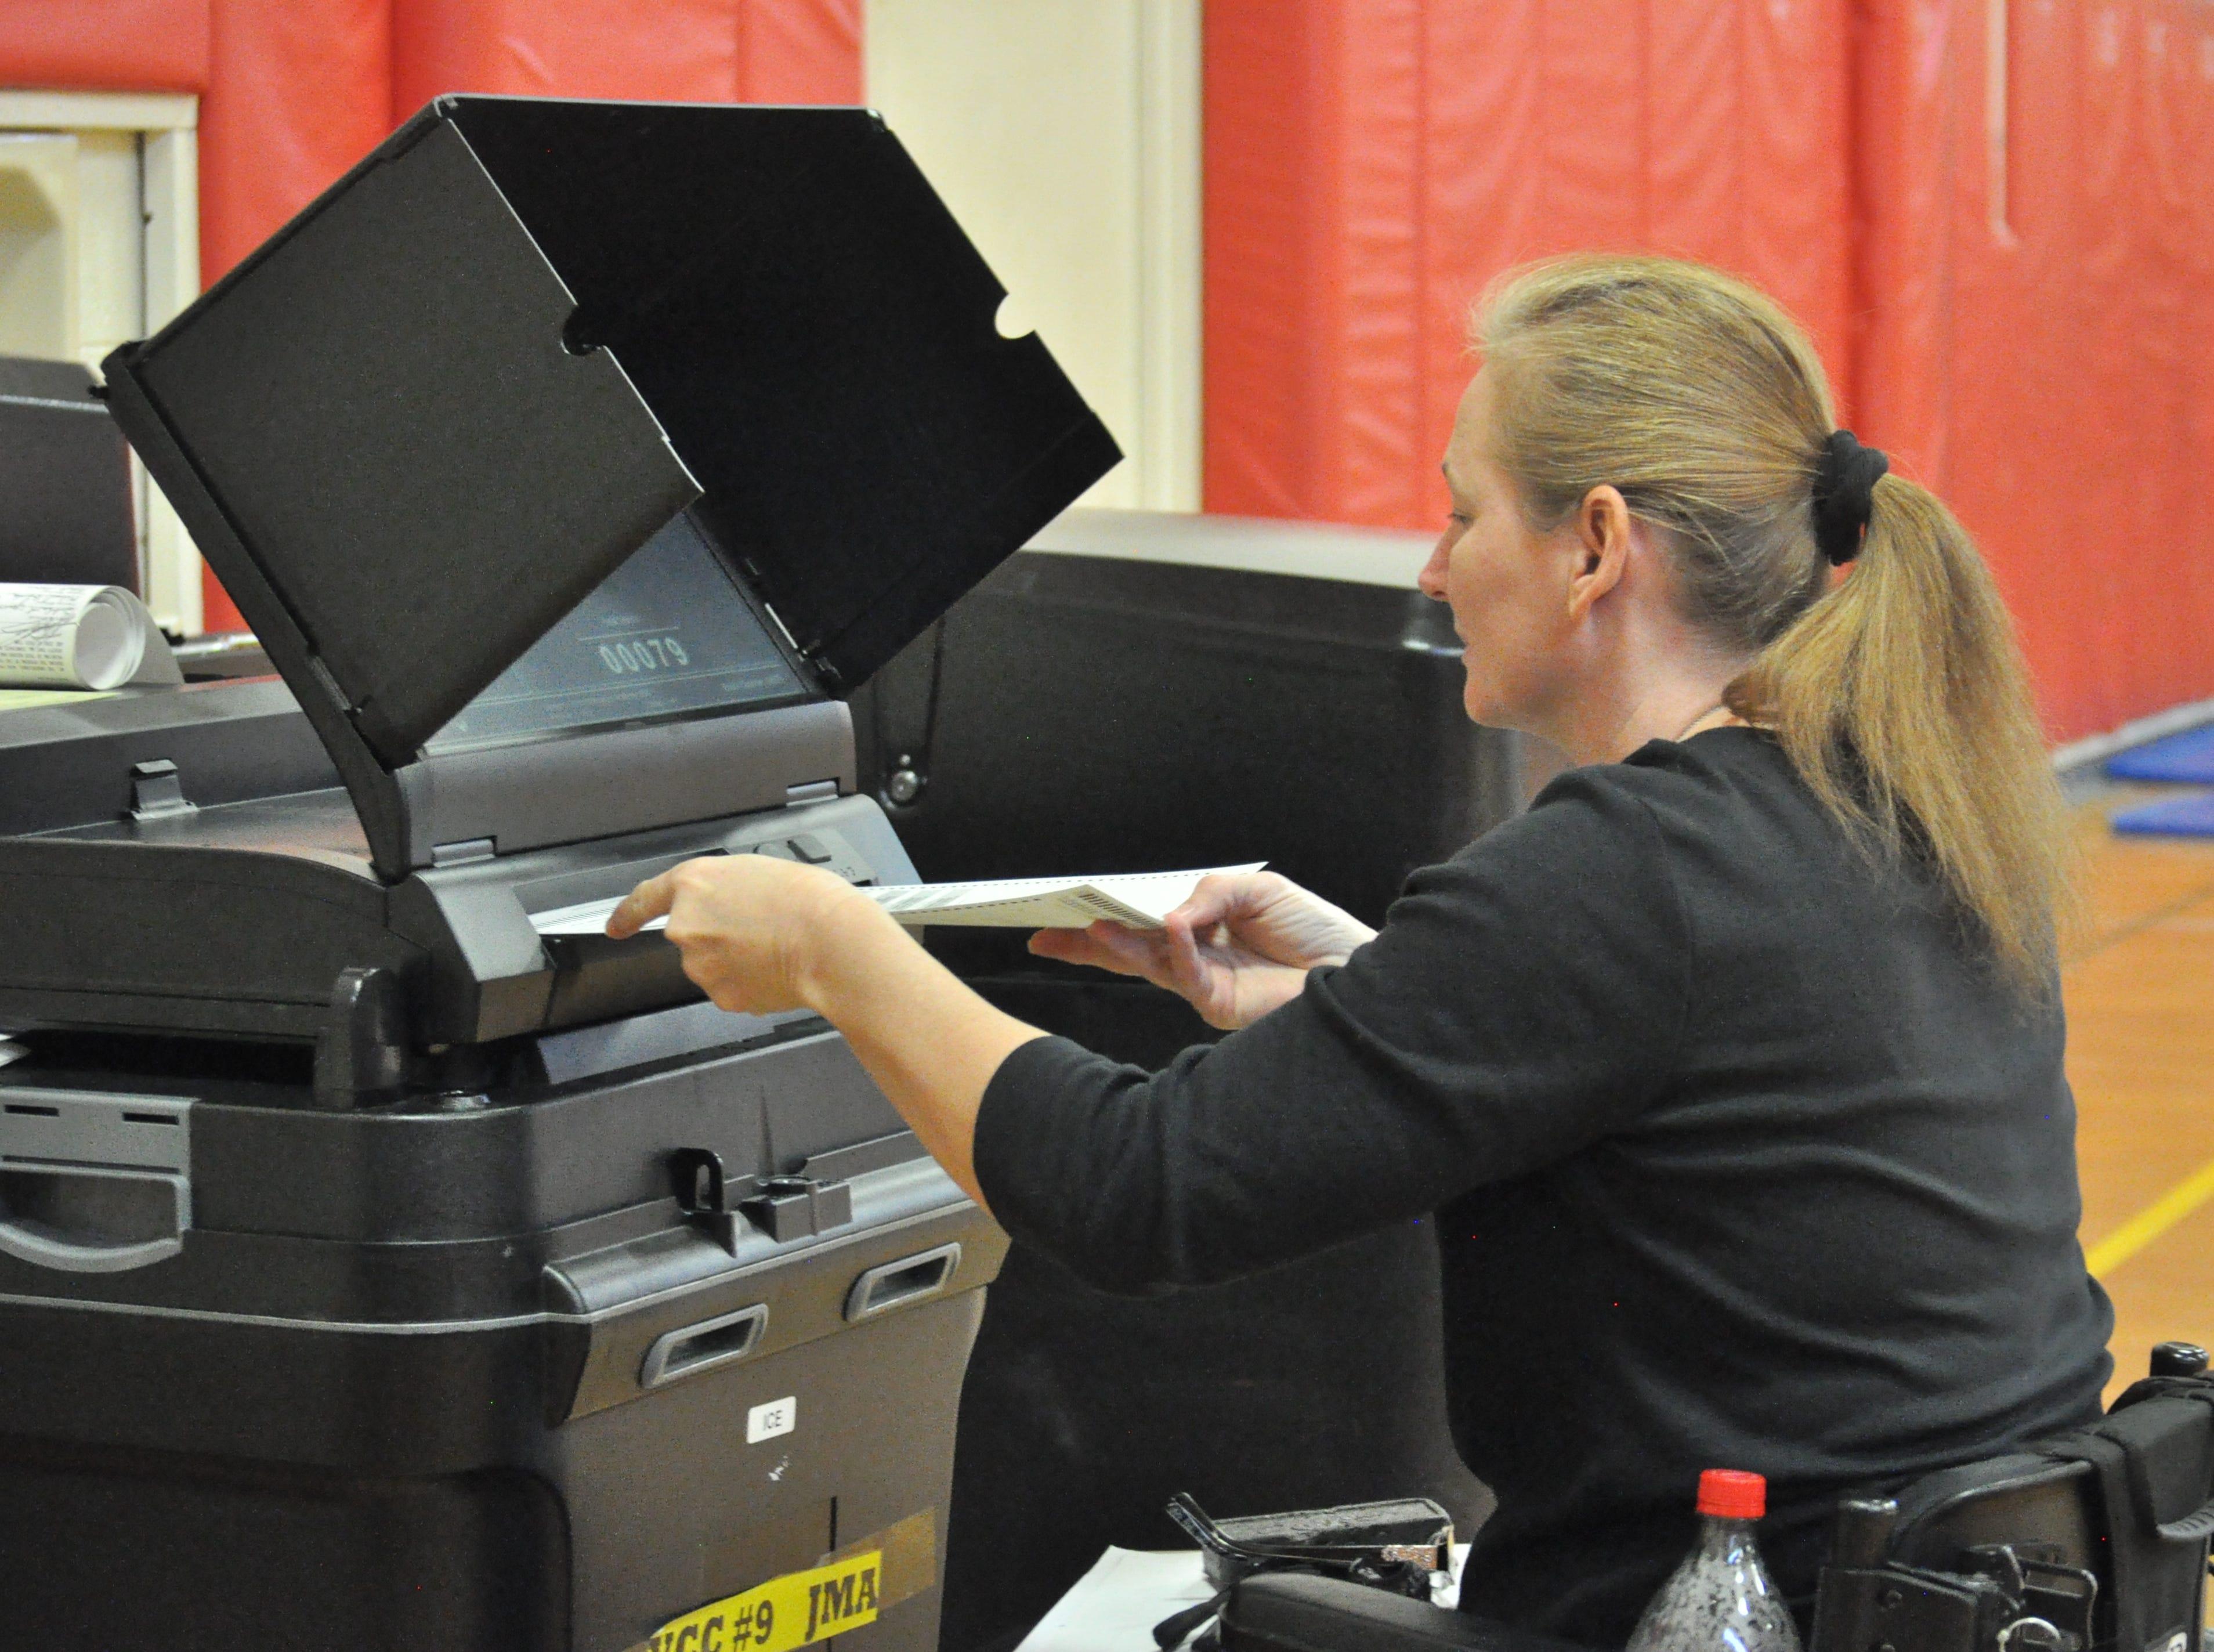 Shellie Schaeffer casts a ballot, Nov. 6, 2018 at Jefferson Montessori Academy.